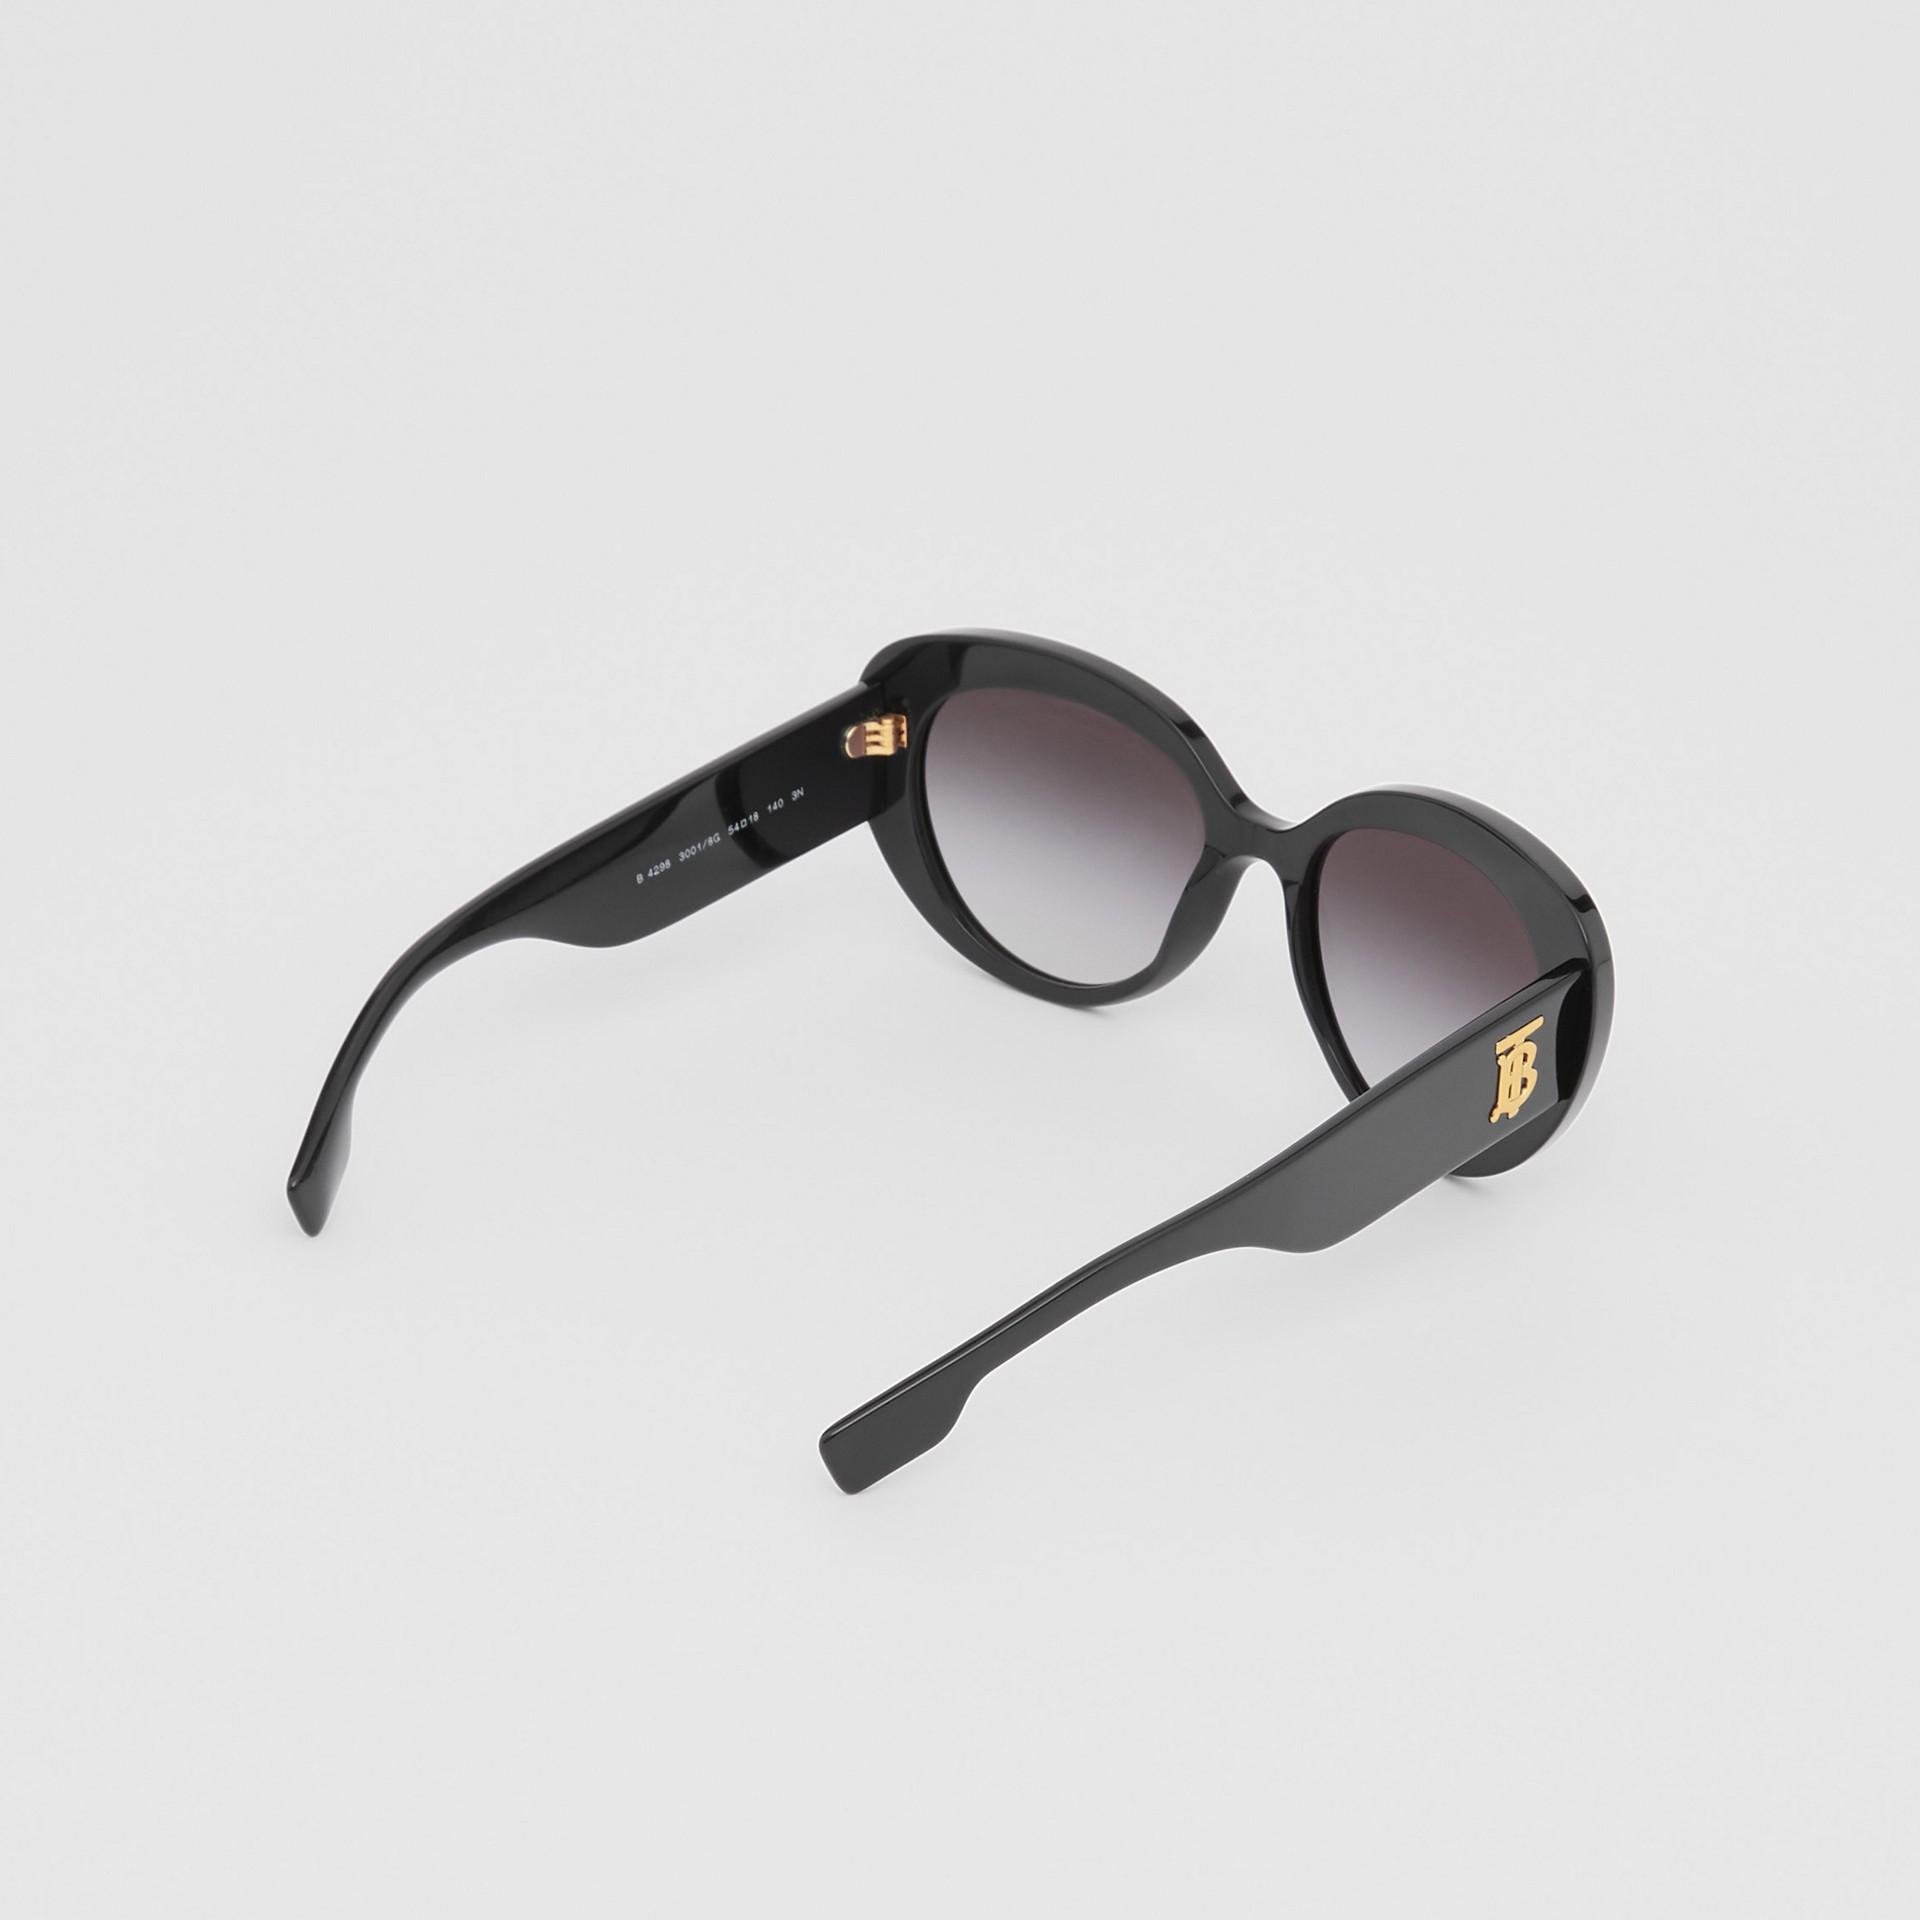 Monogram Motif Cat-eye Frame Sunglasses in Black - Women | Burberry - gallery image 3